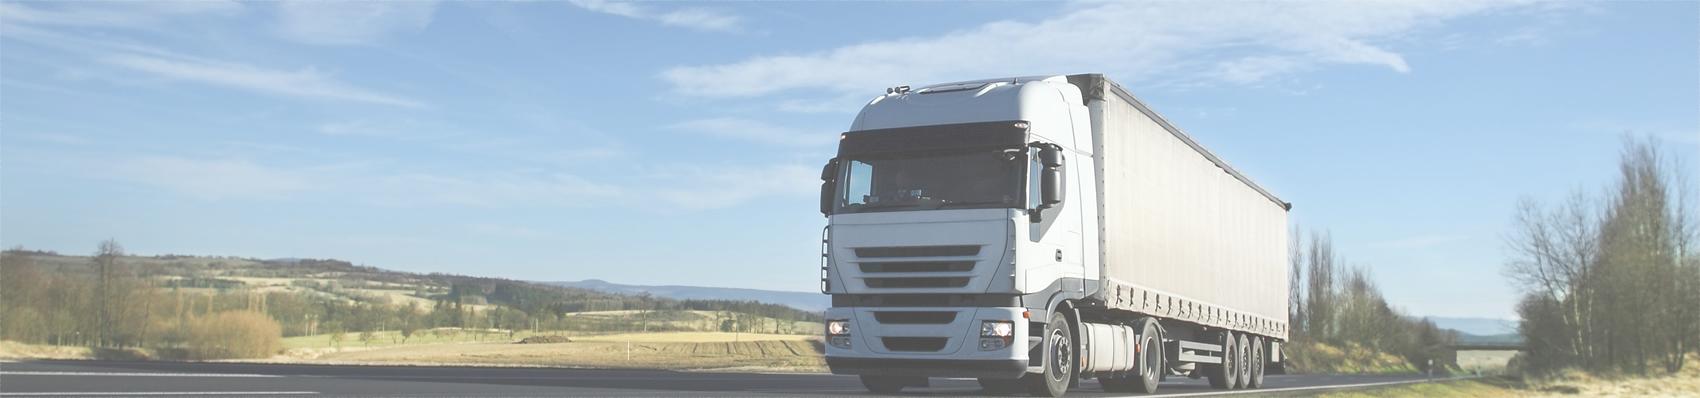 Trucking Law Defense Attorney